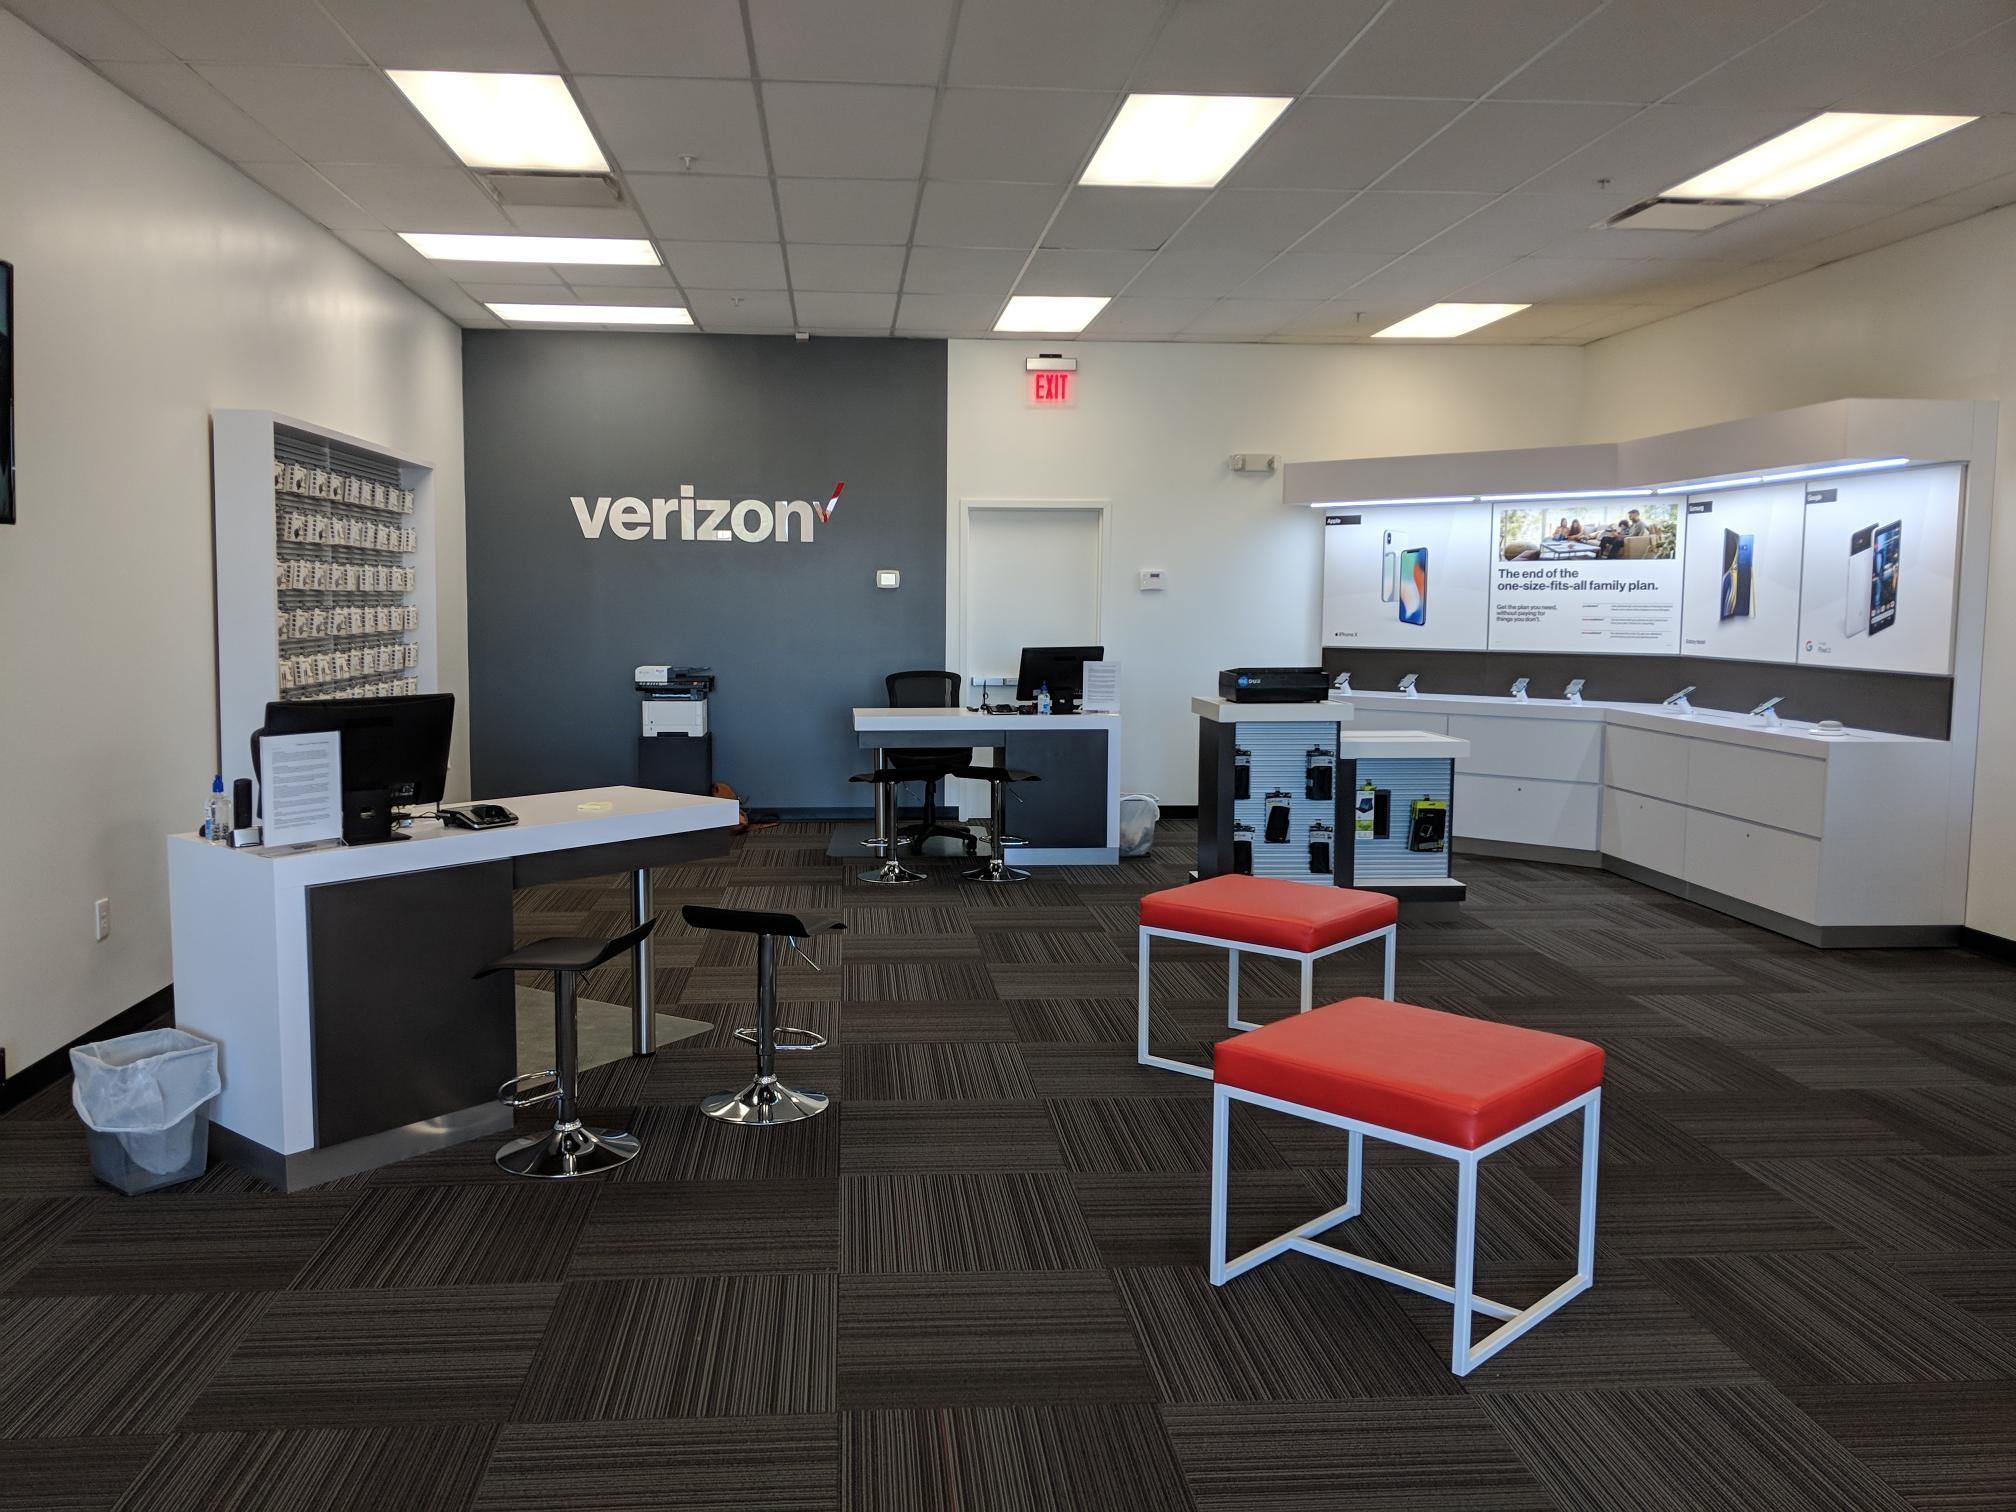 Verizon Authorized Retailer - Wireless Zone image 3